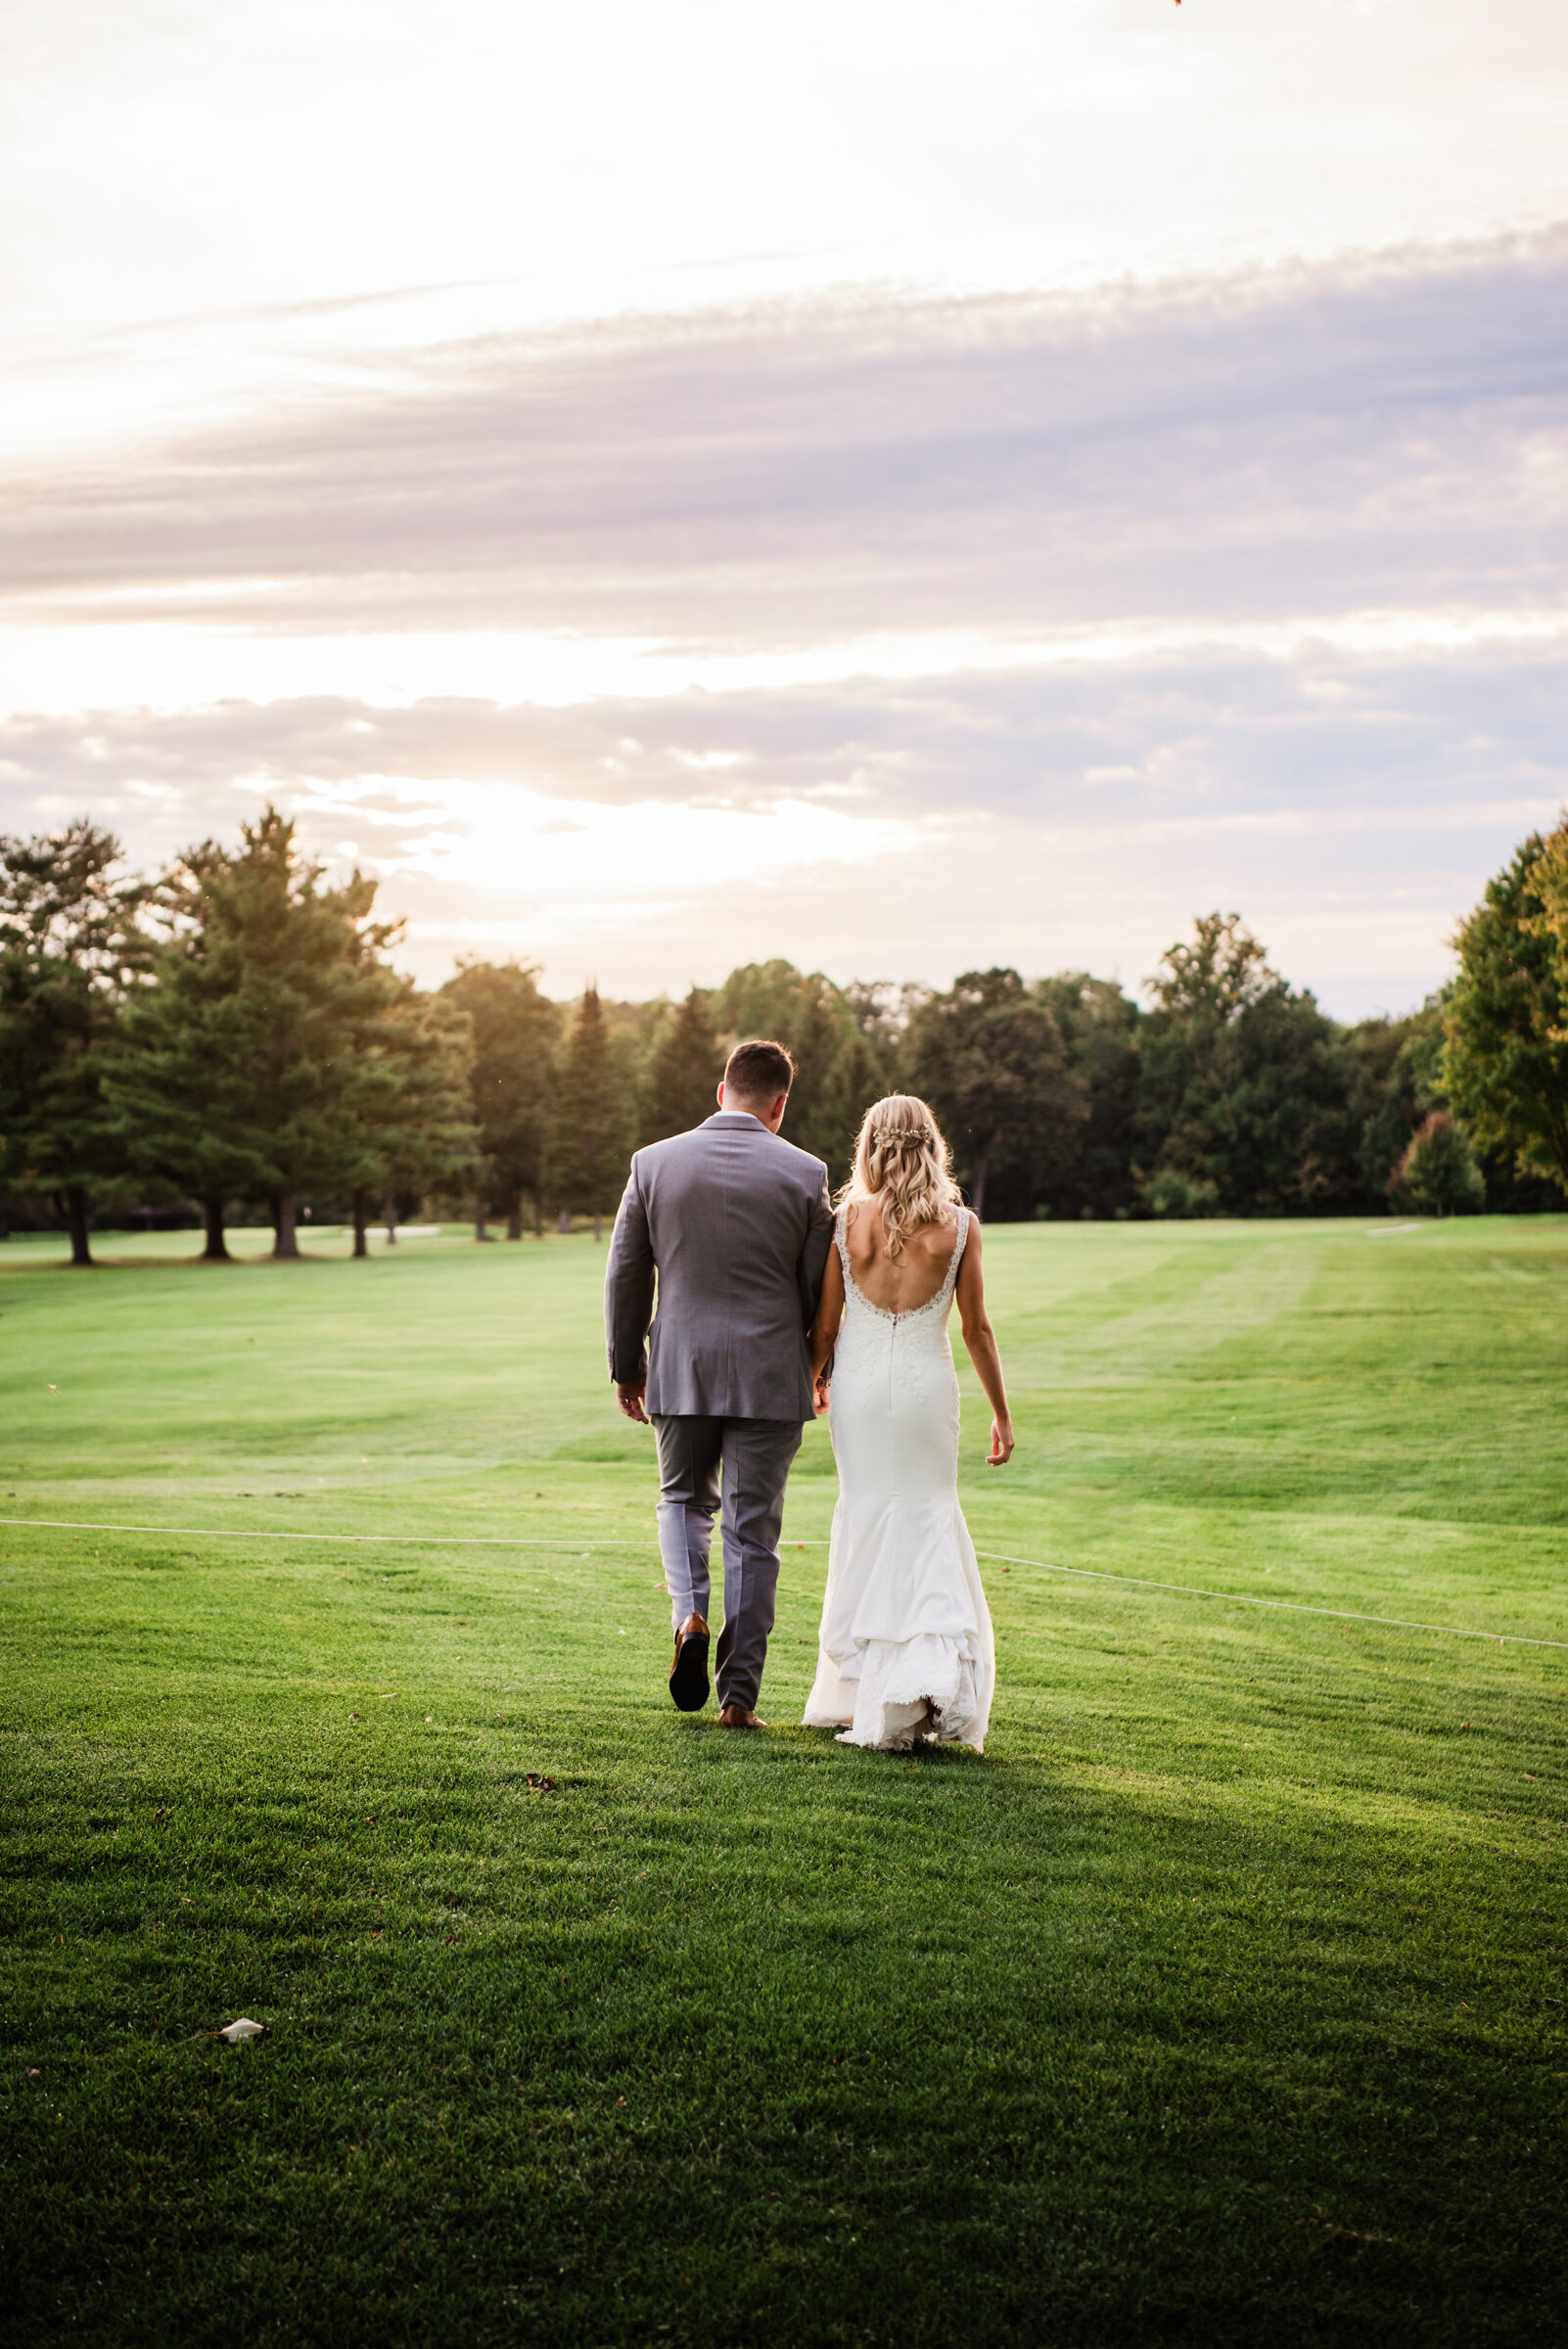 Deerfield_Country_Club_Rochester_Wedding_JILL_STUDIO_Rochester_NY_Photographer_DSC_6958.jpg